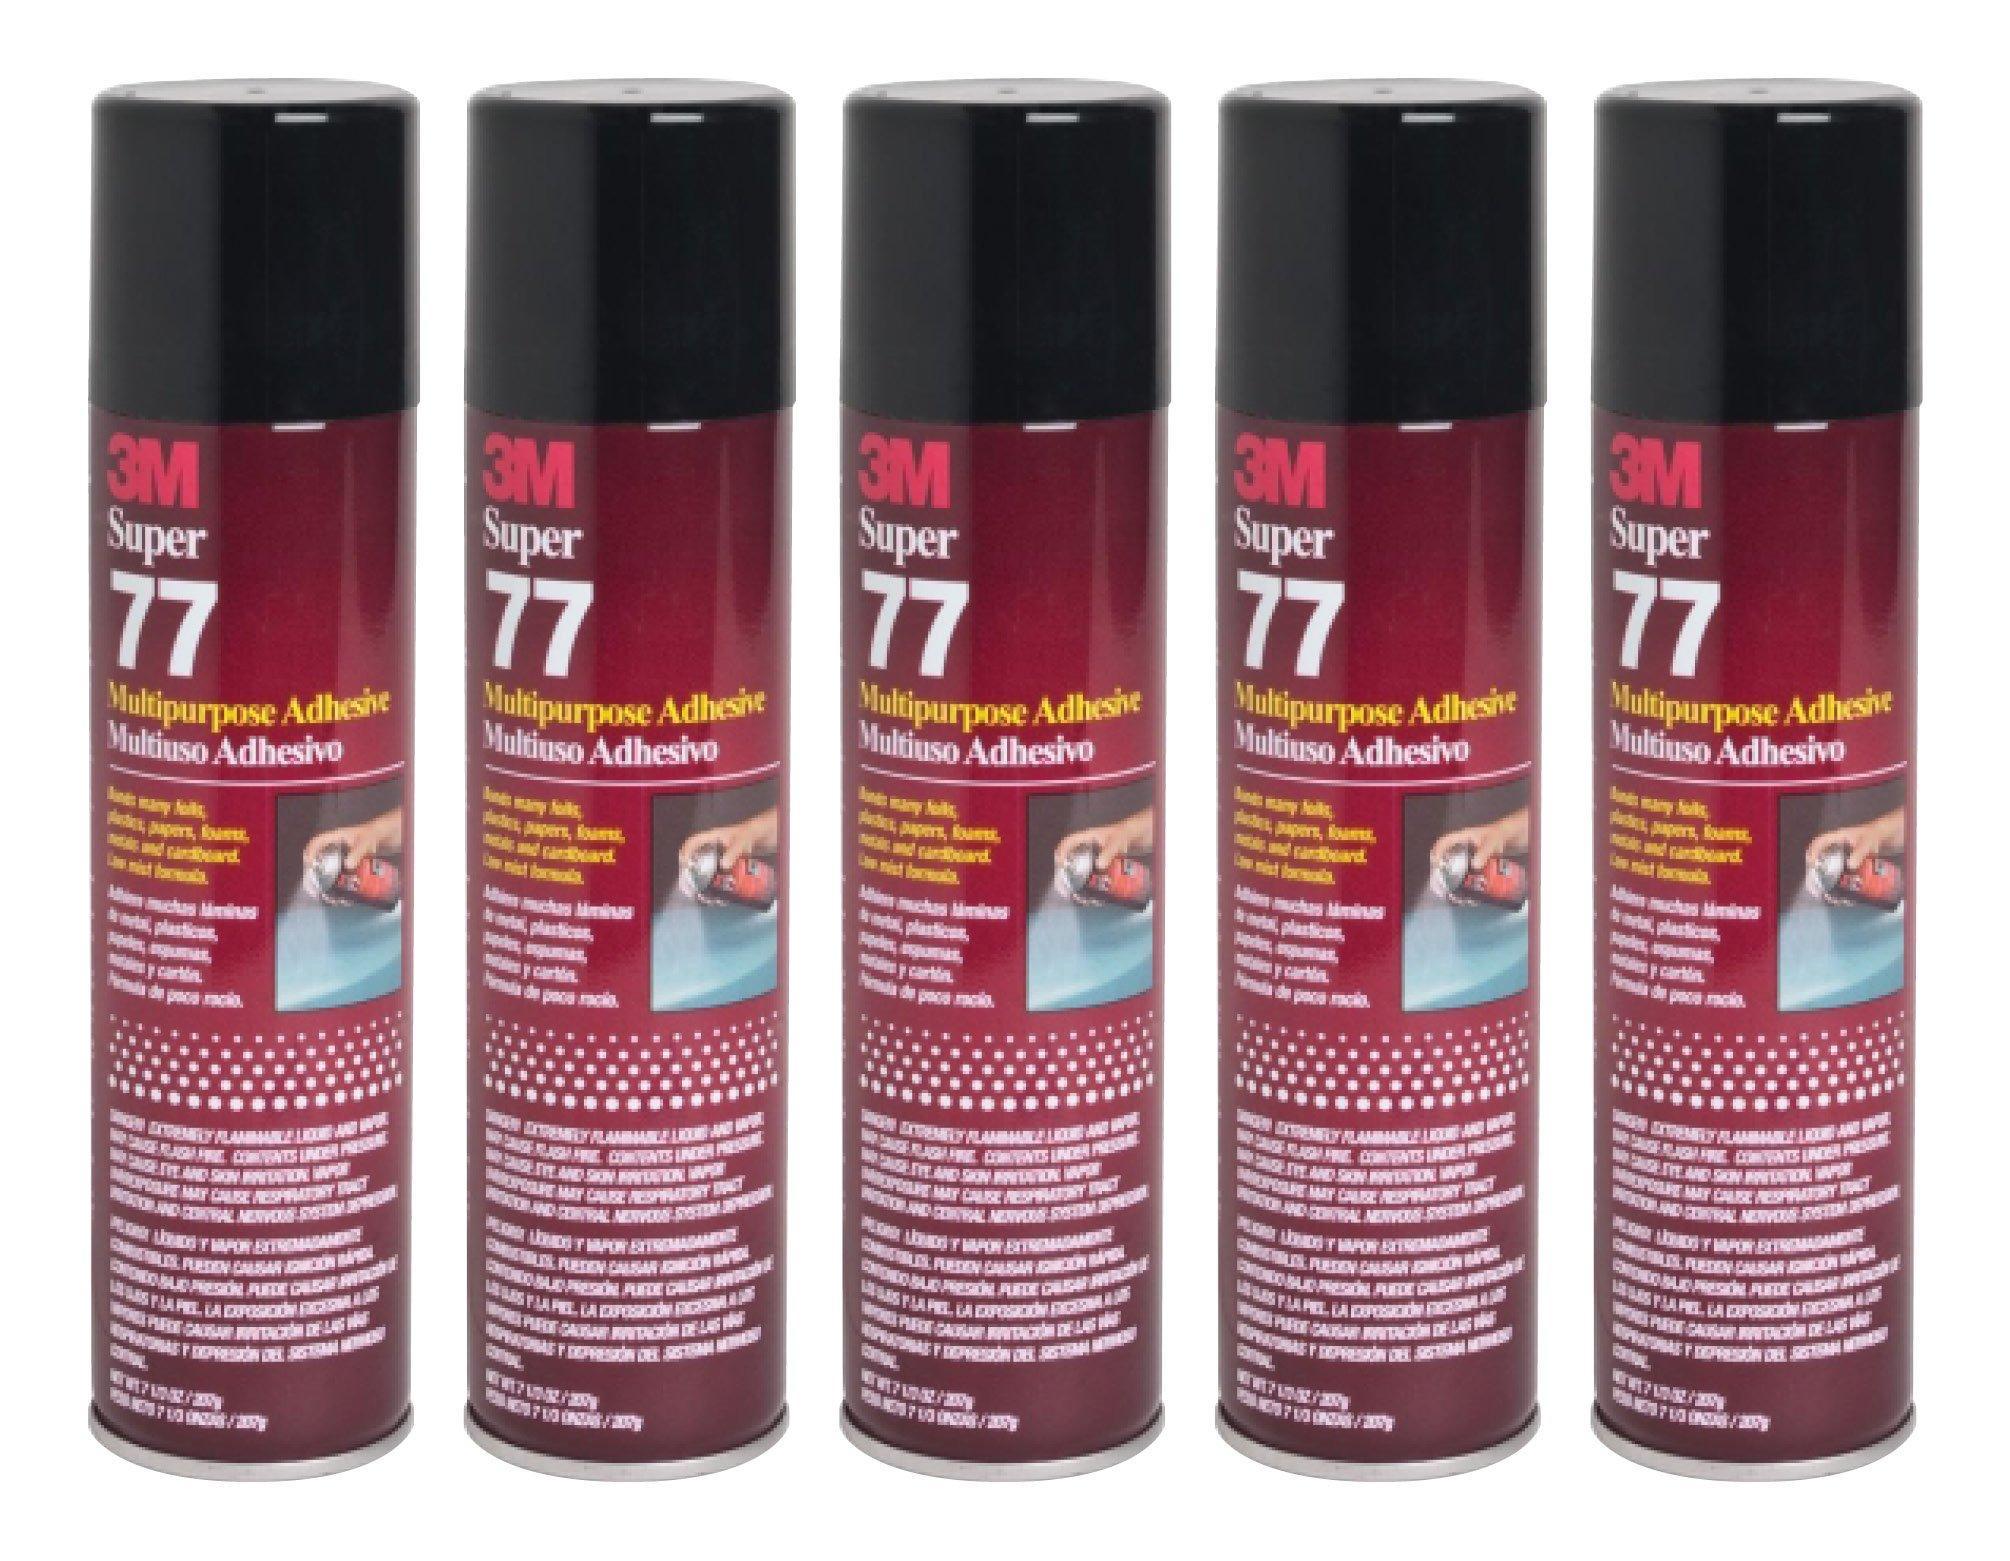 QTY5 3M SUPER 77 7.3oz LARGE SPRAY GLUE ADHESIVE for SPEAKER BOX ENCLOSURE by 3M SUPER 77